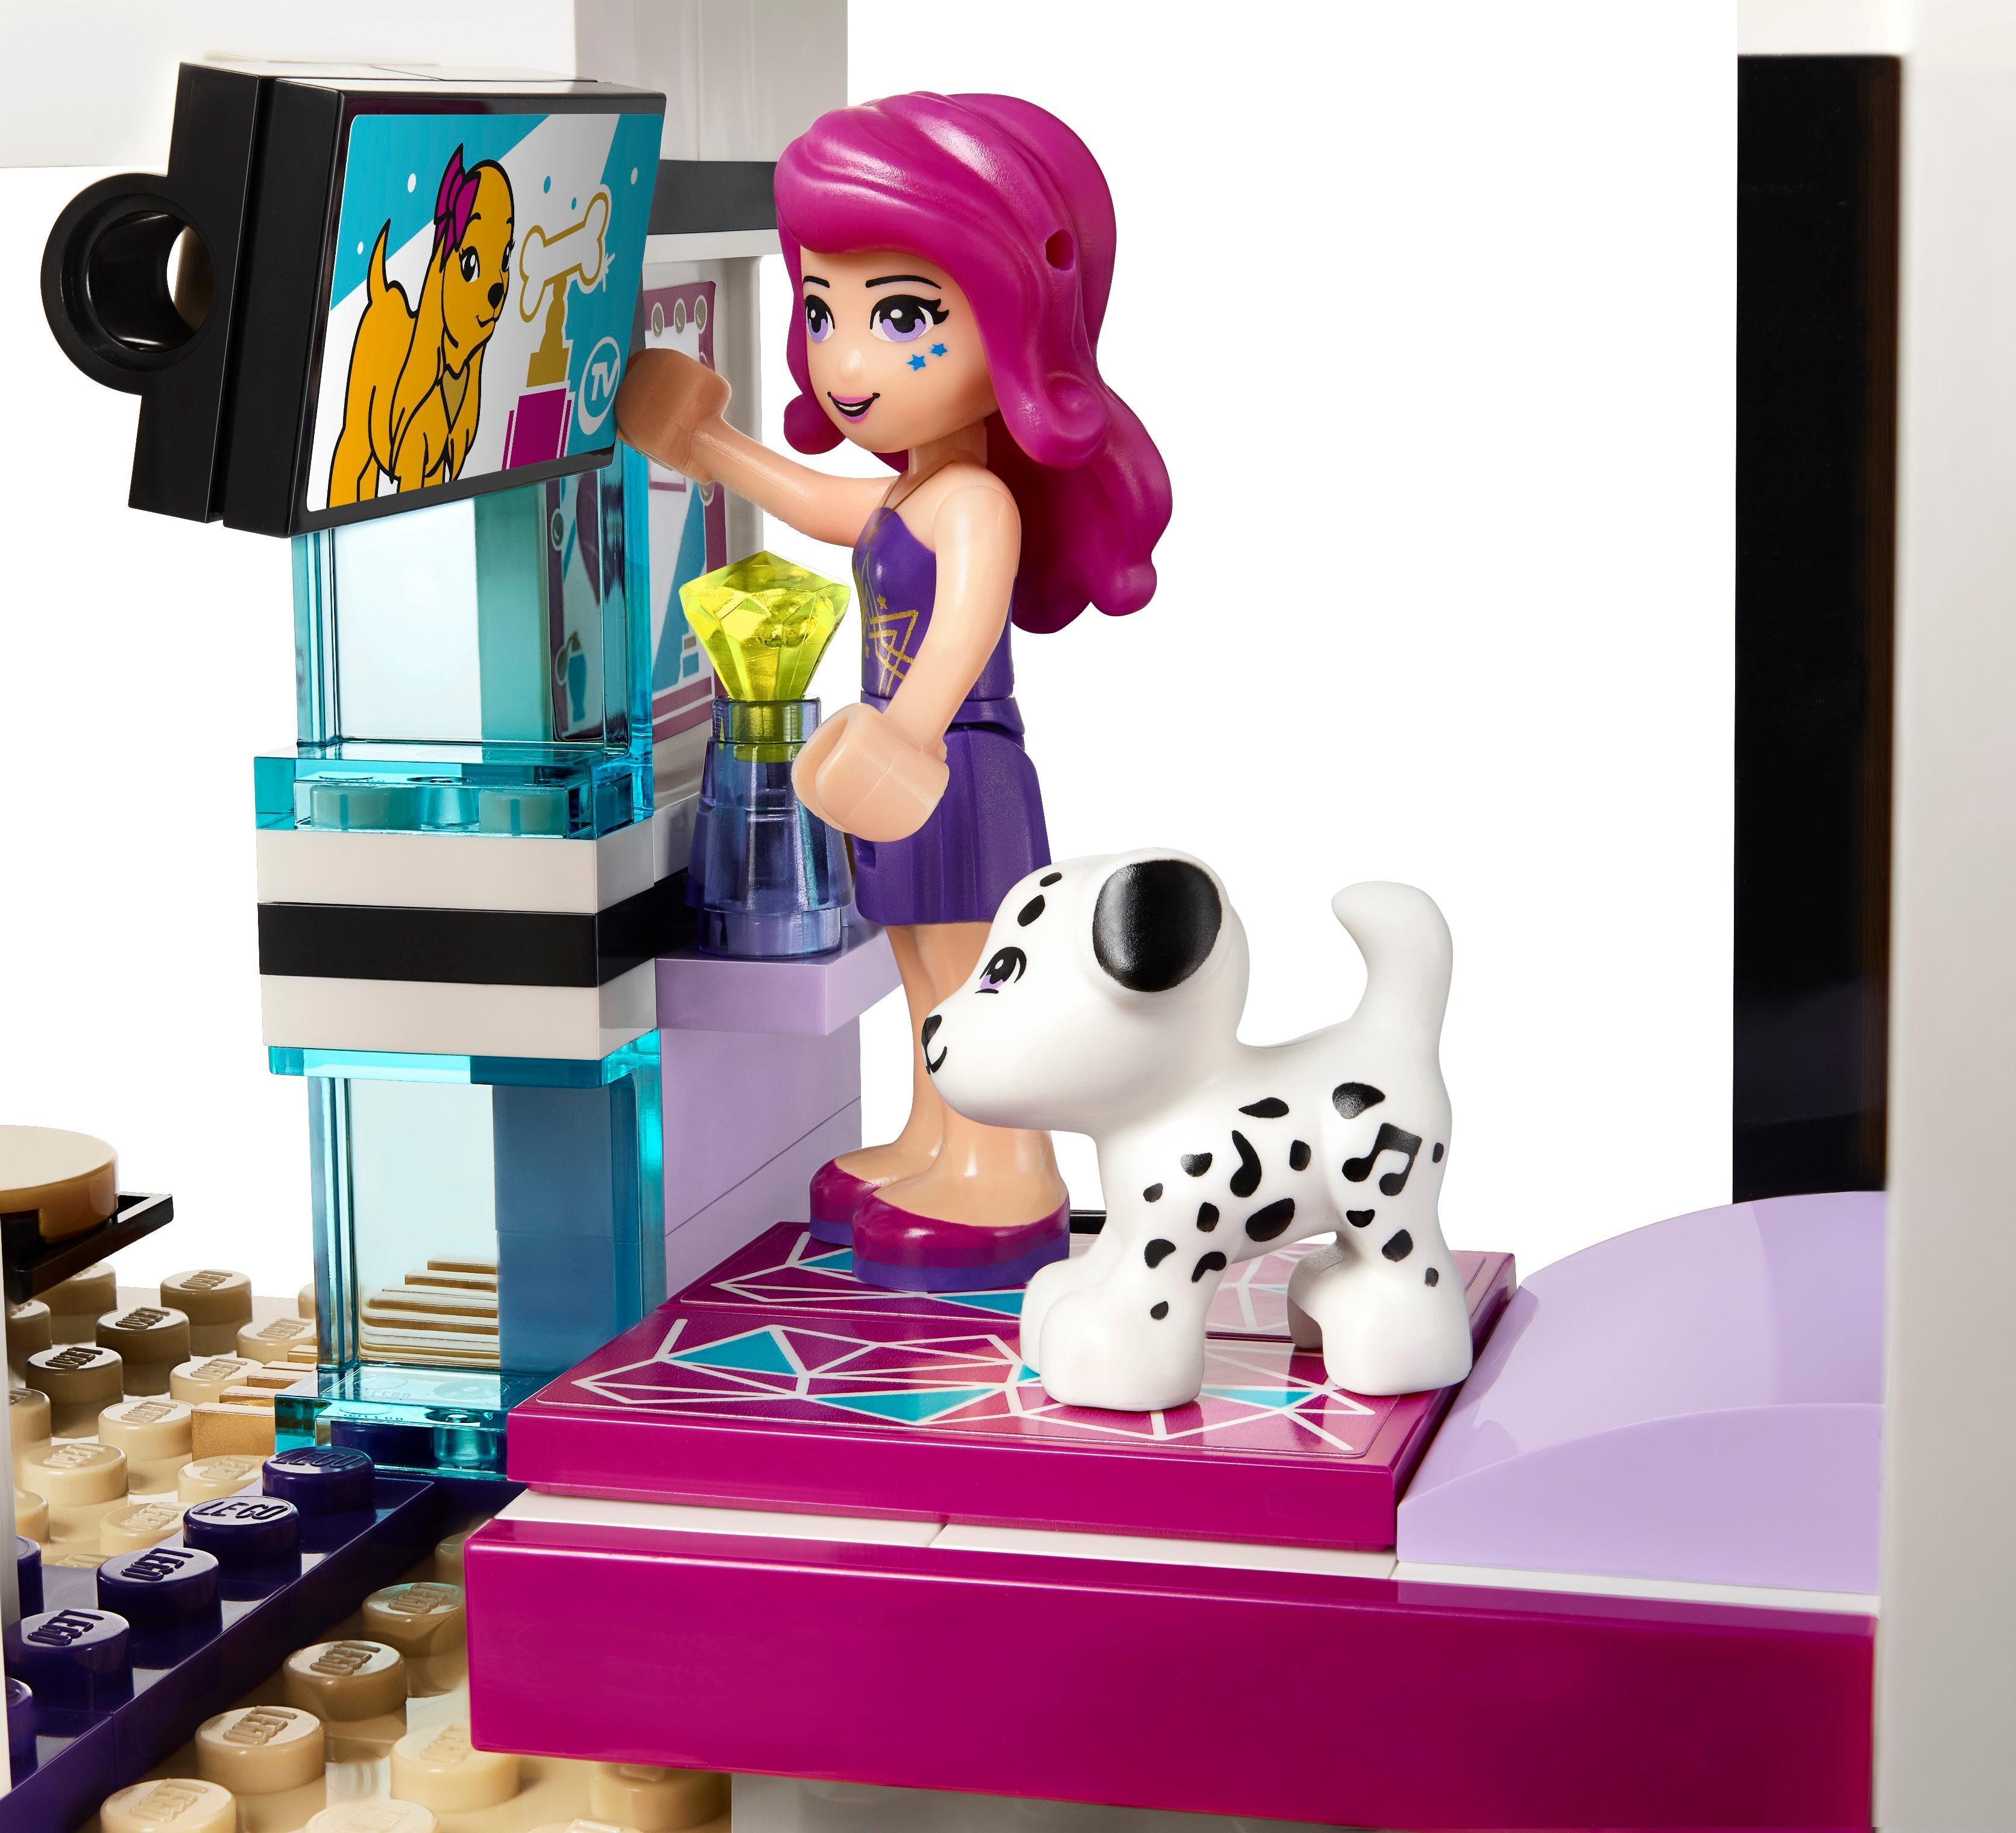 Lego 41135 friends livi 39 s pop star house multi coloured - Lego friends casa de livi ...